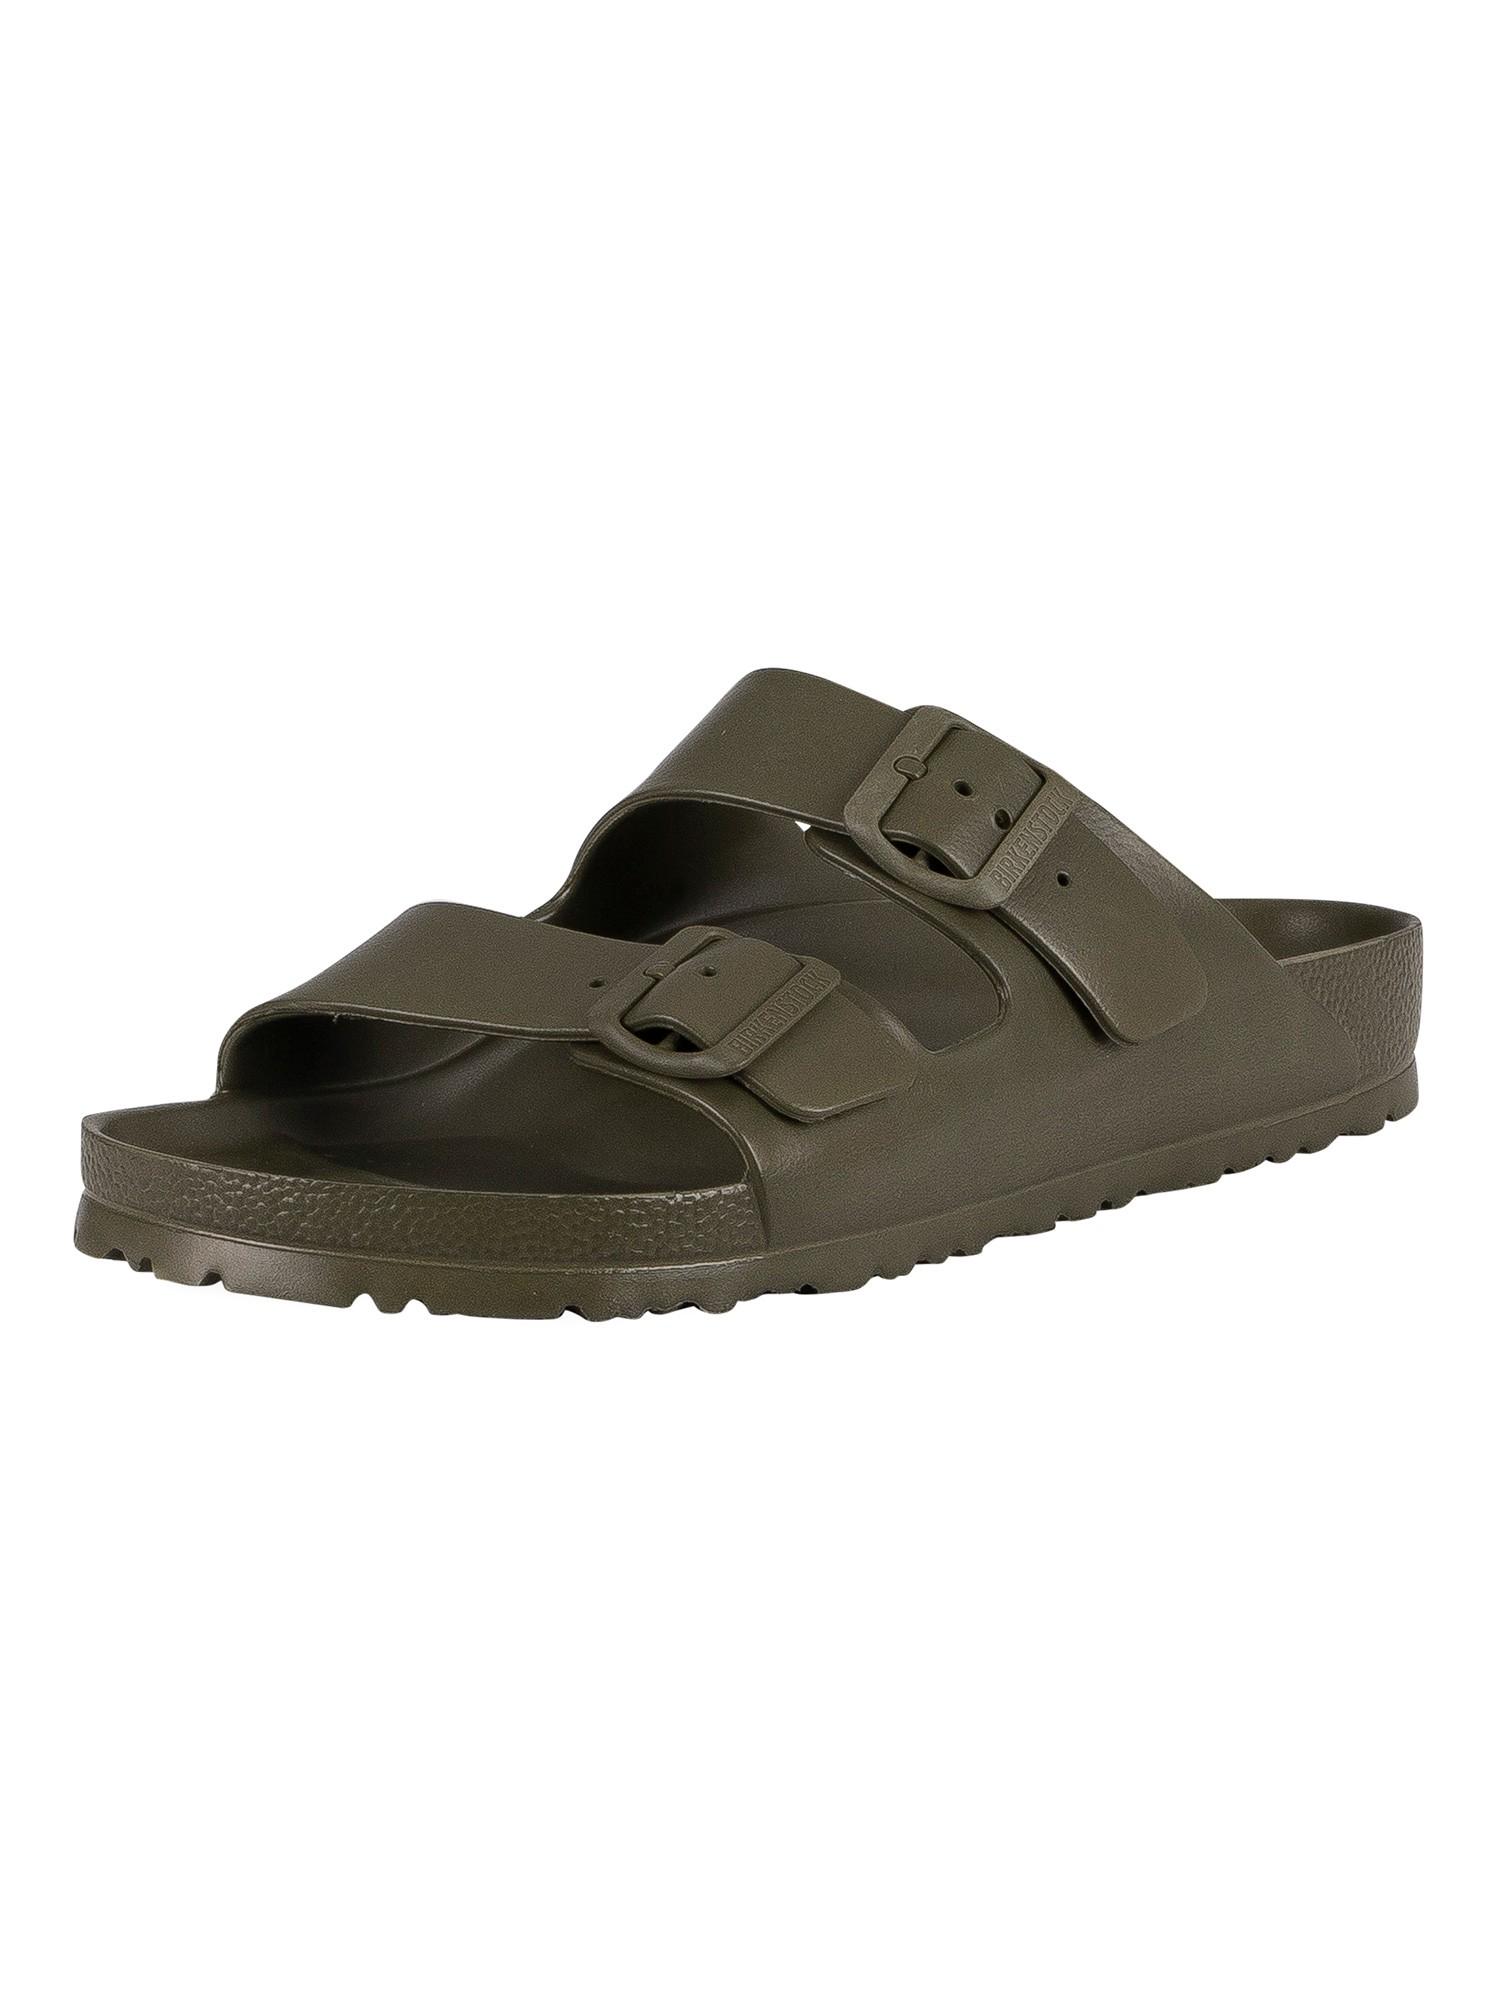 Arizona-EVA-Sandals